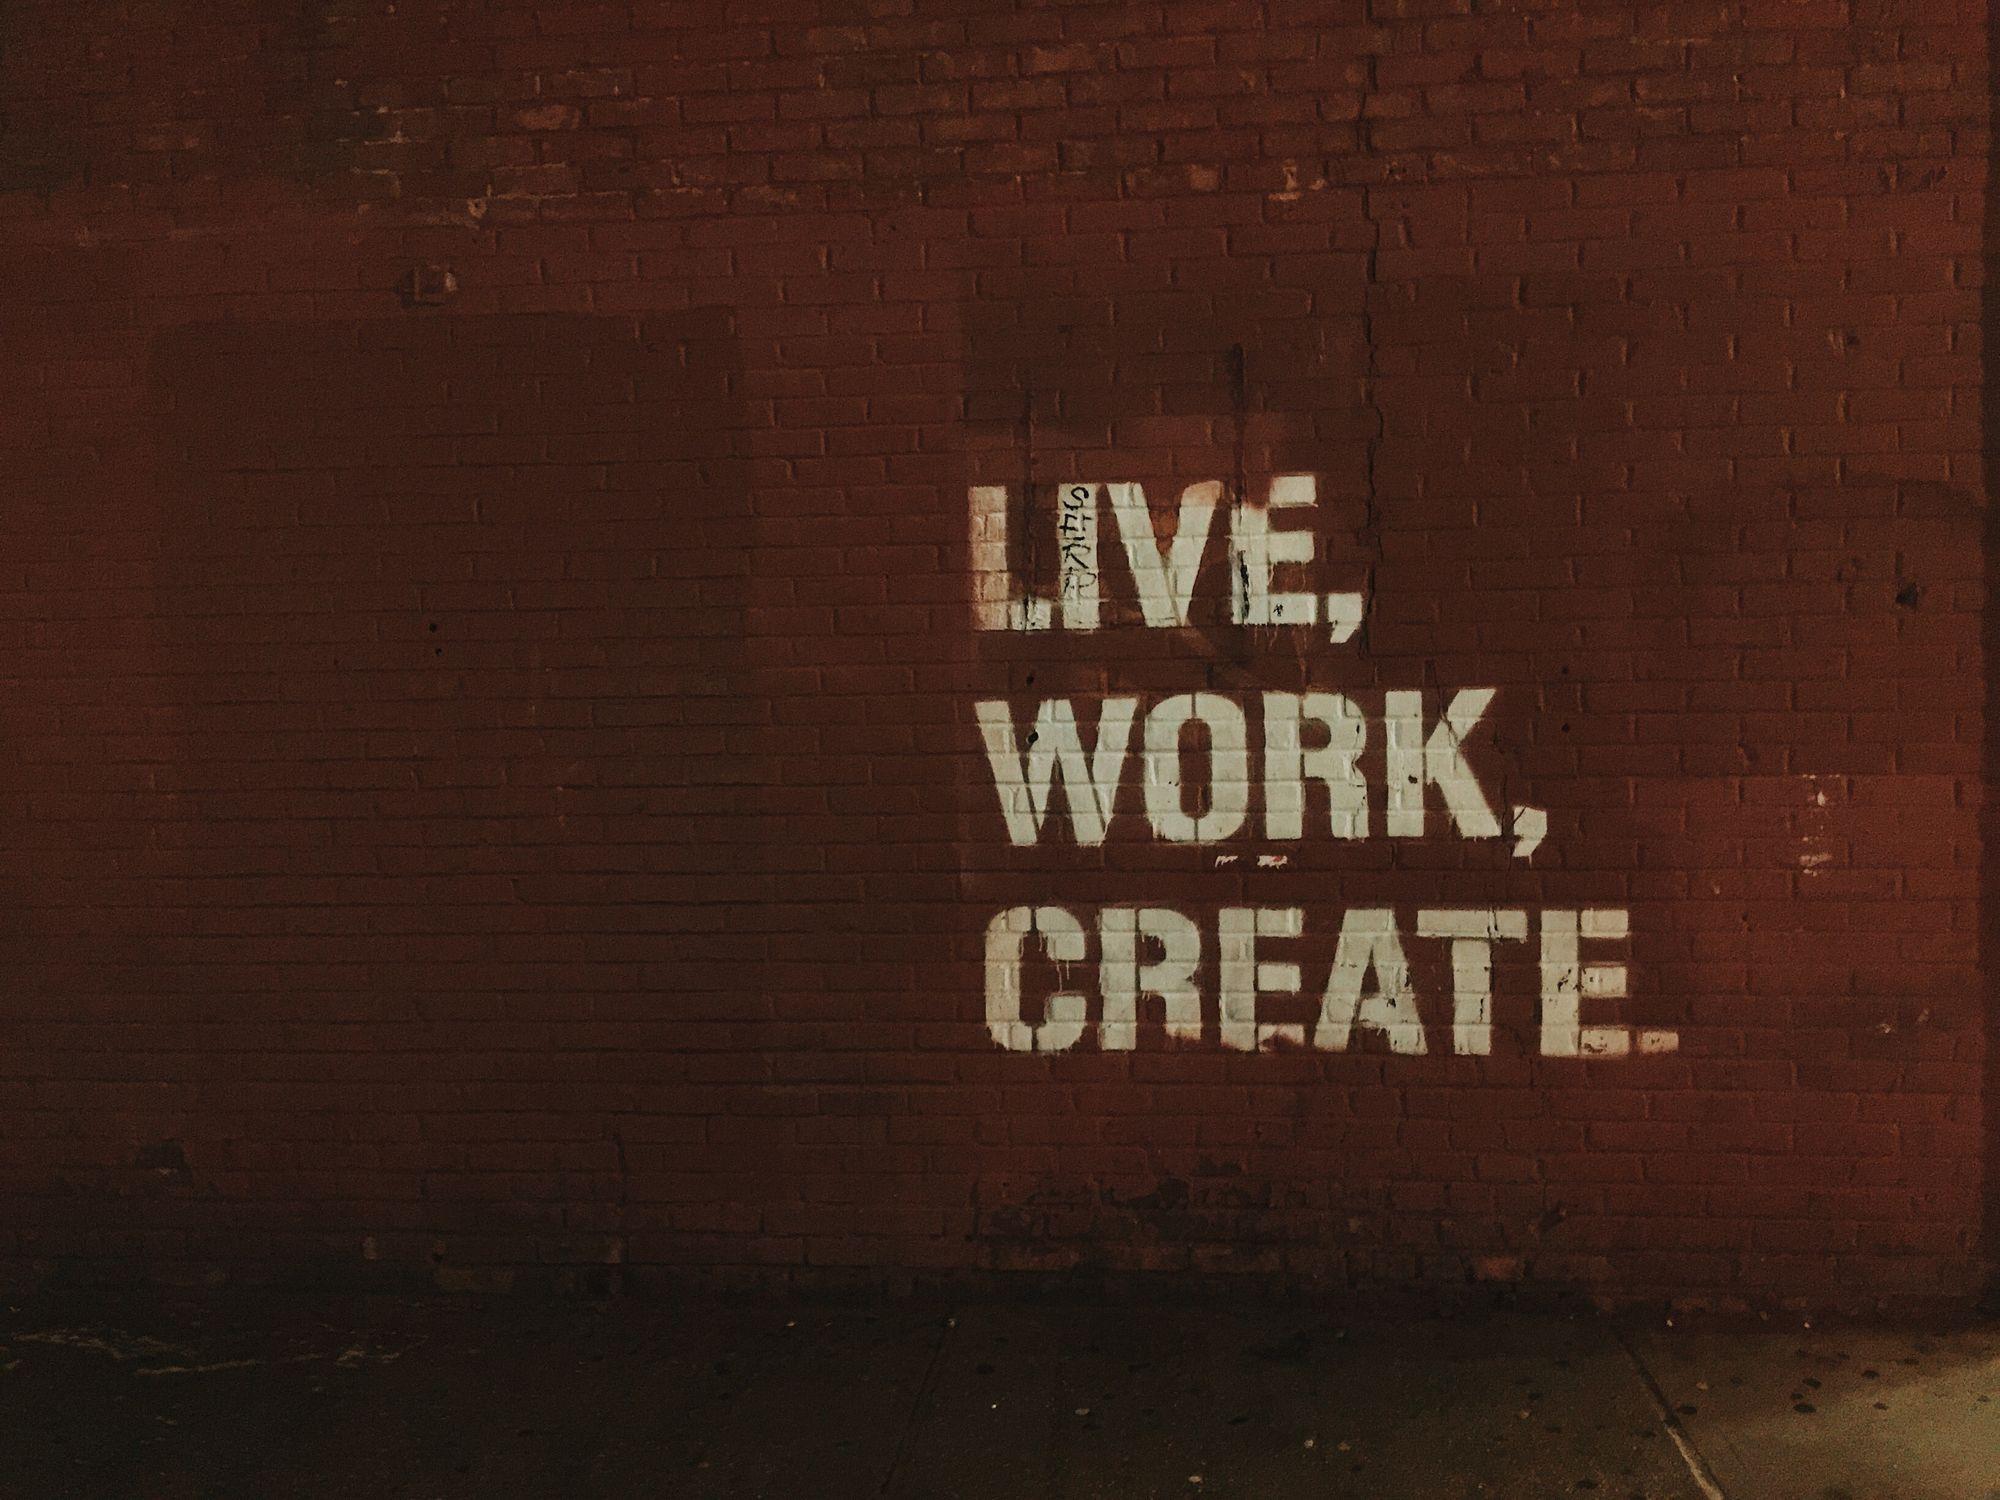 work-life balance poster